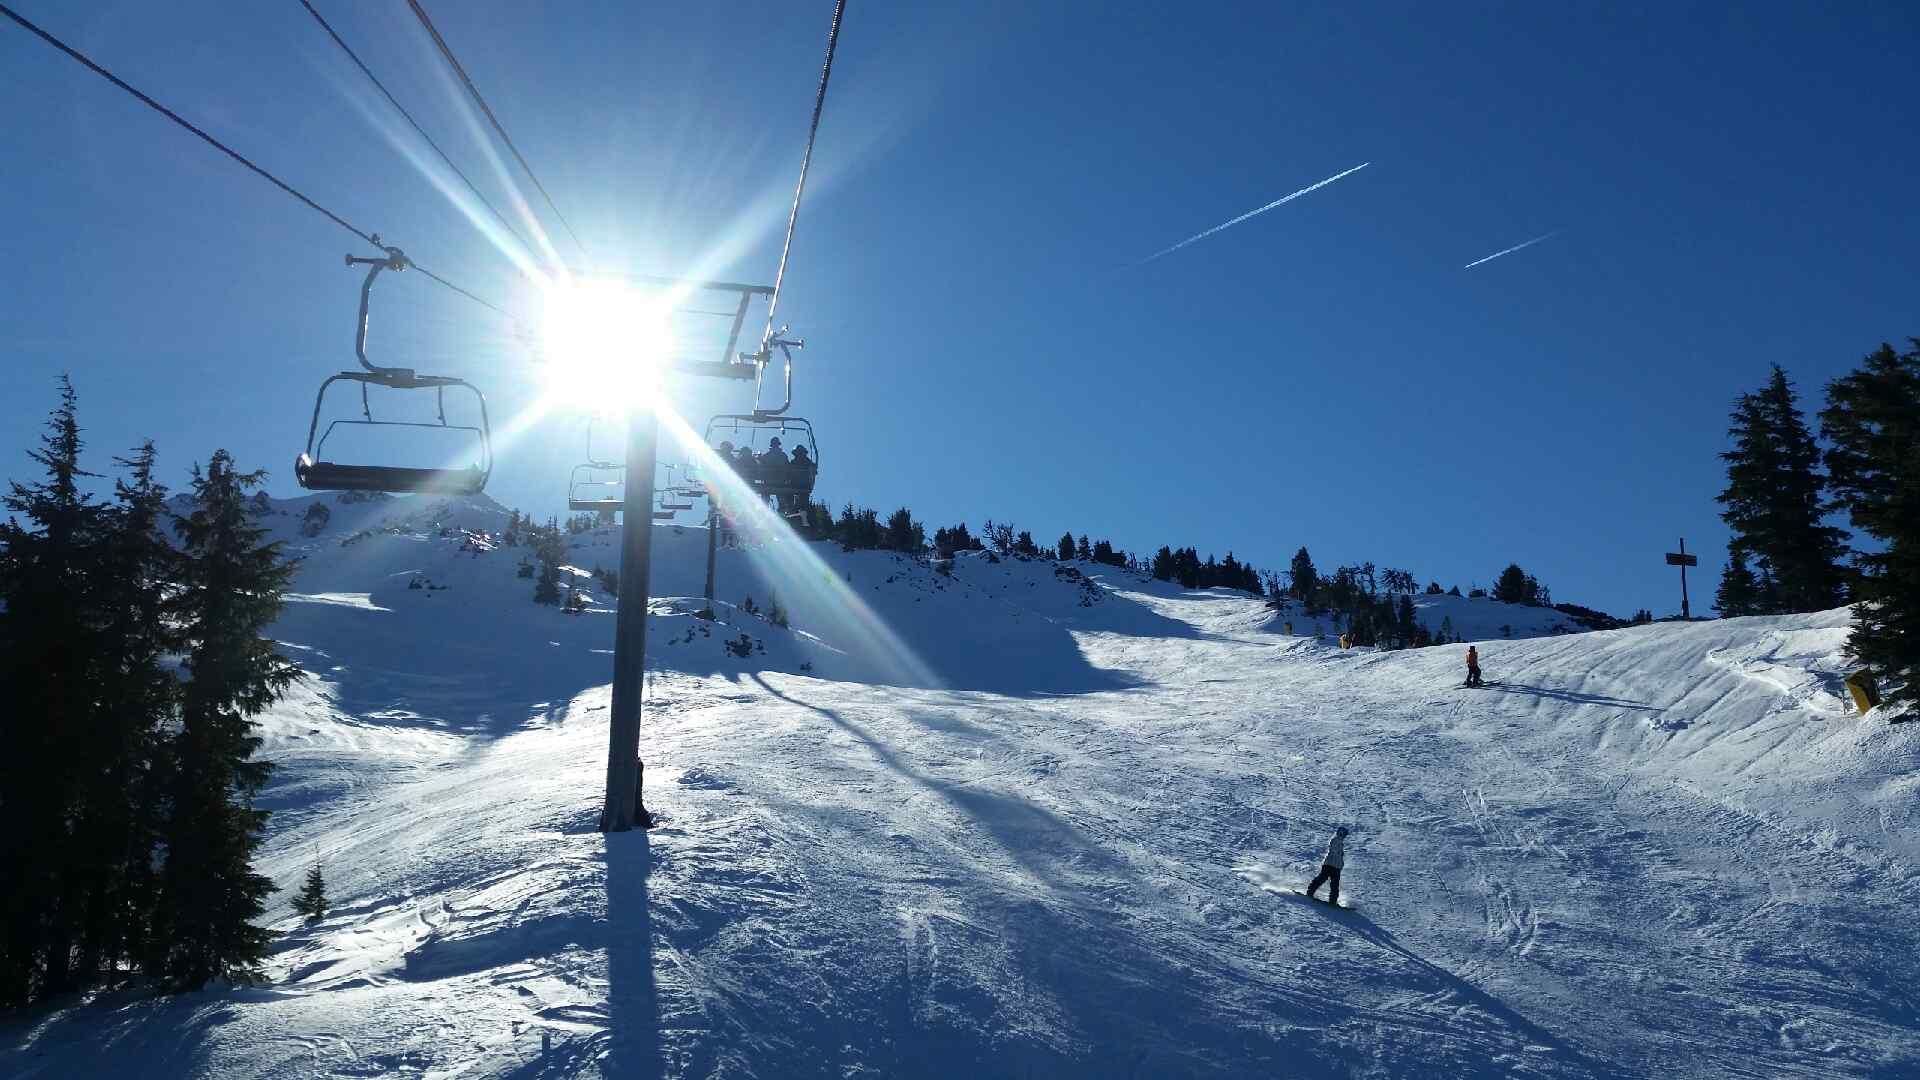 ski run with sun glare and blue skies